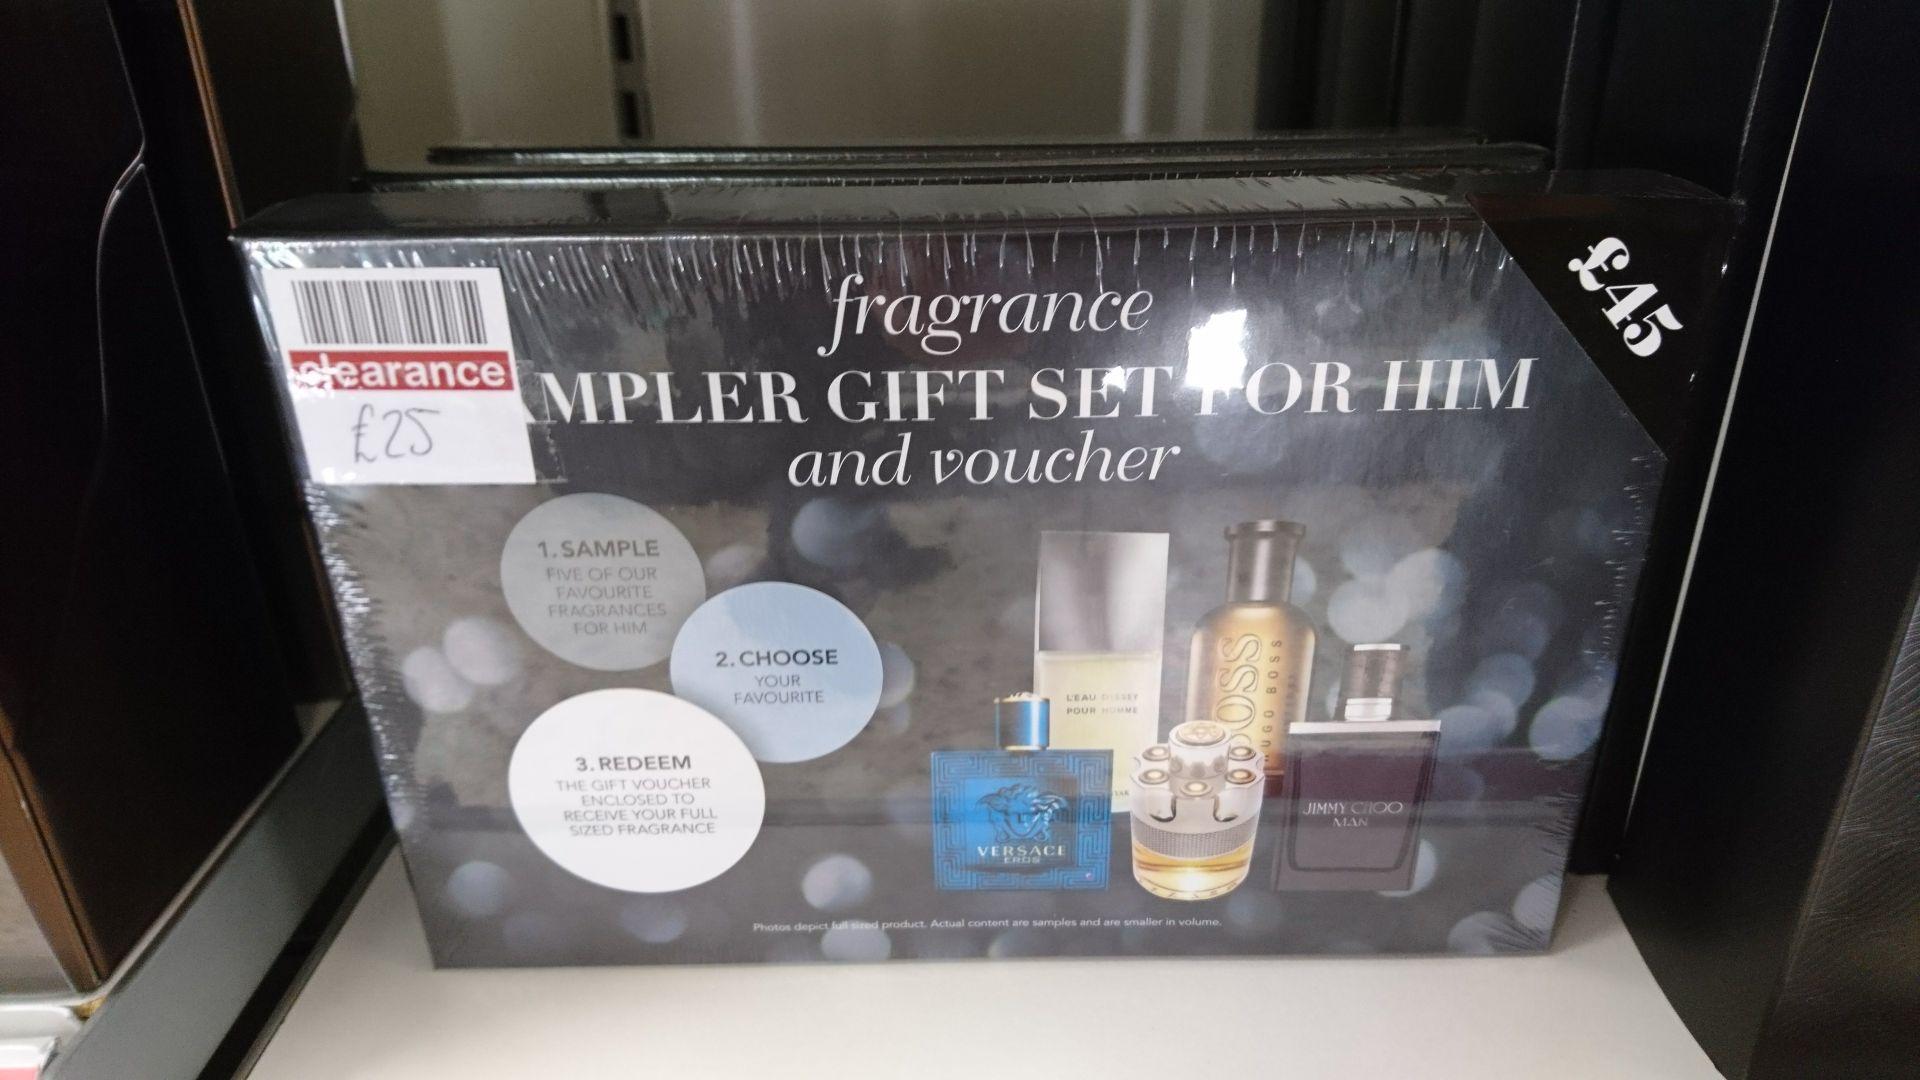 Fragrance sampler gift set, 5 samplers and a voucher for 50ml/75ml bottle - £25 at Boots instore